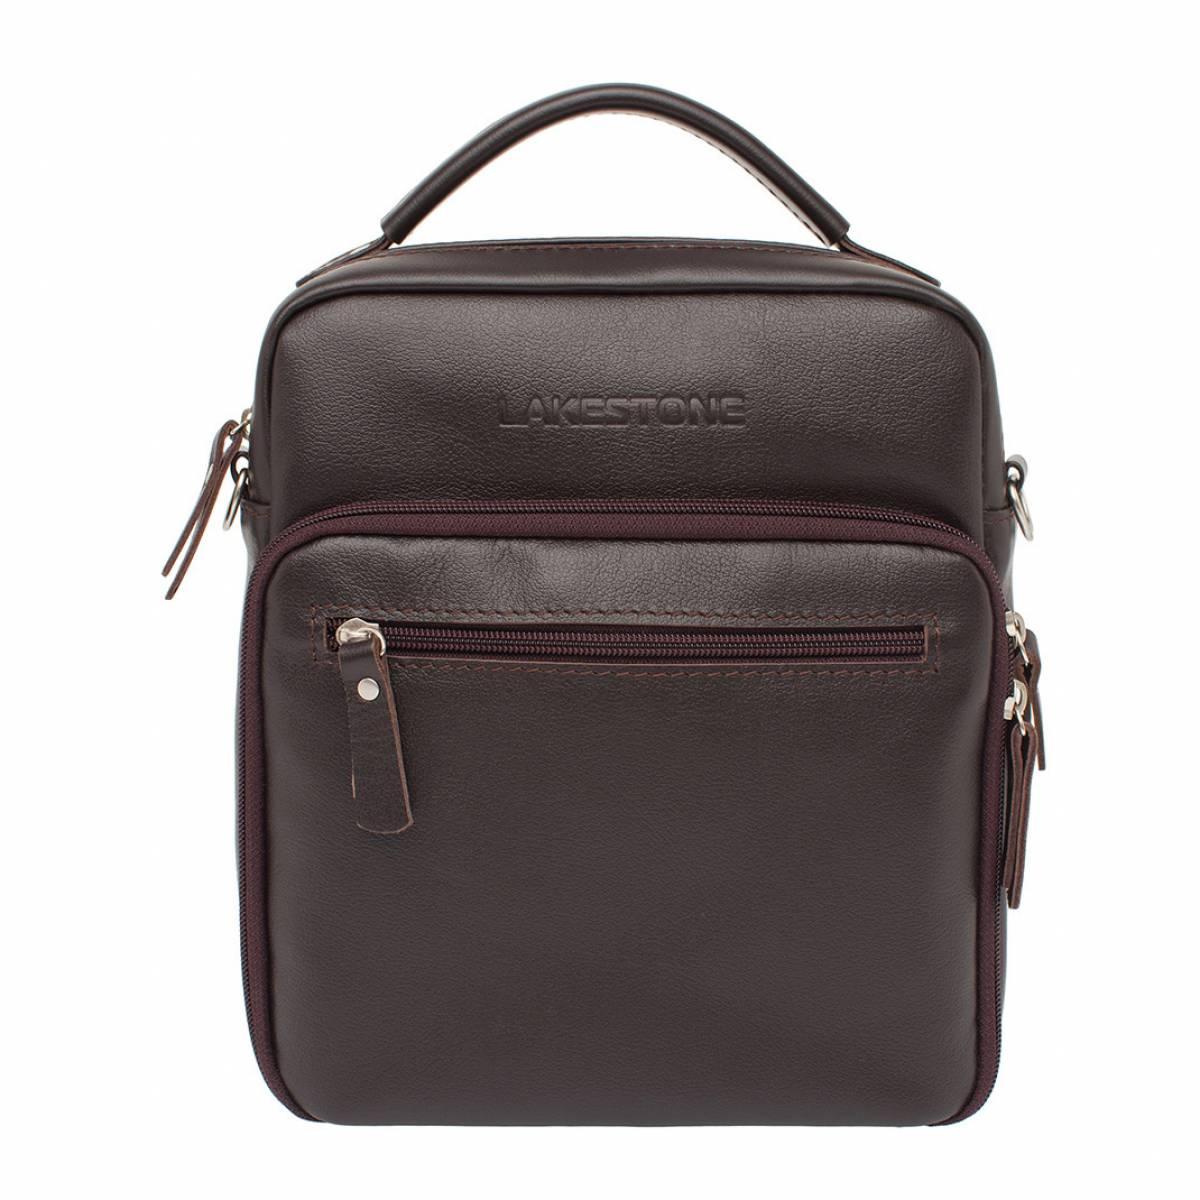 Мужская сумка через плечо Logan Brown